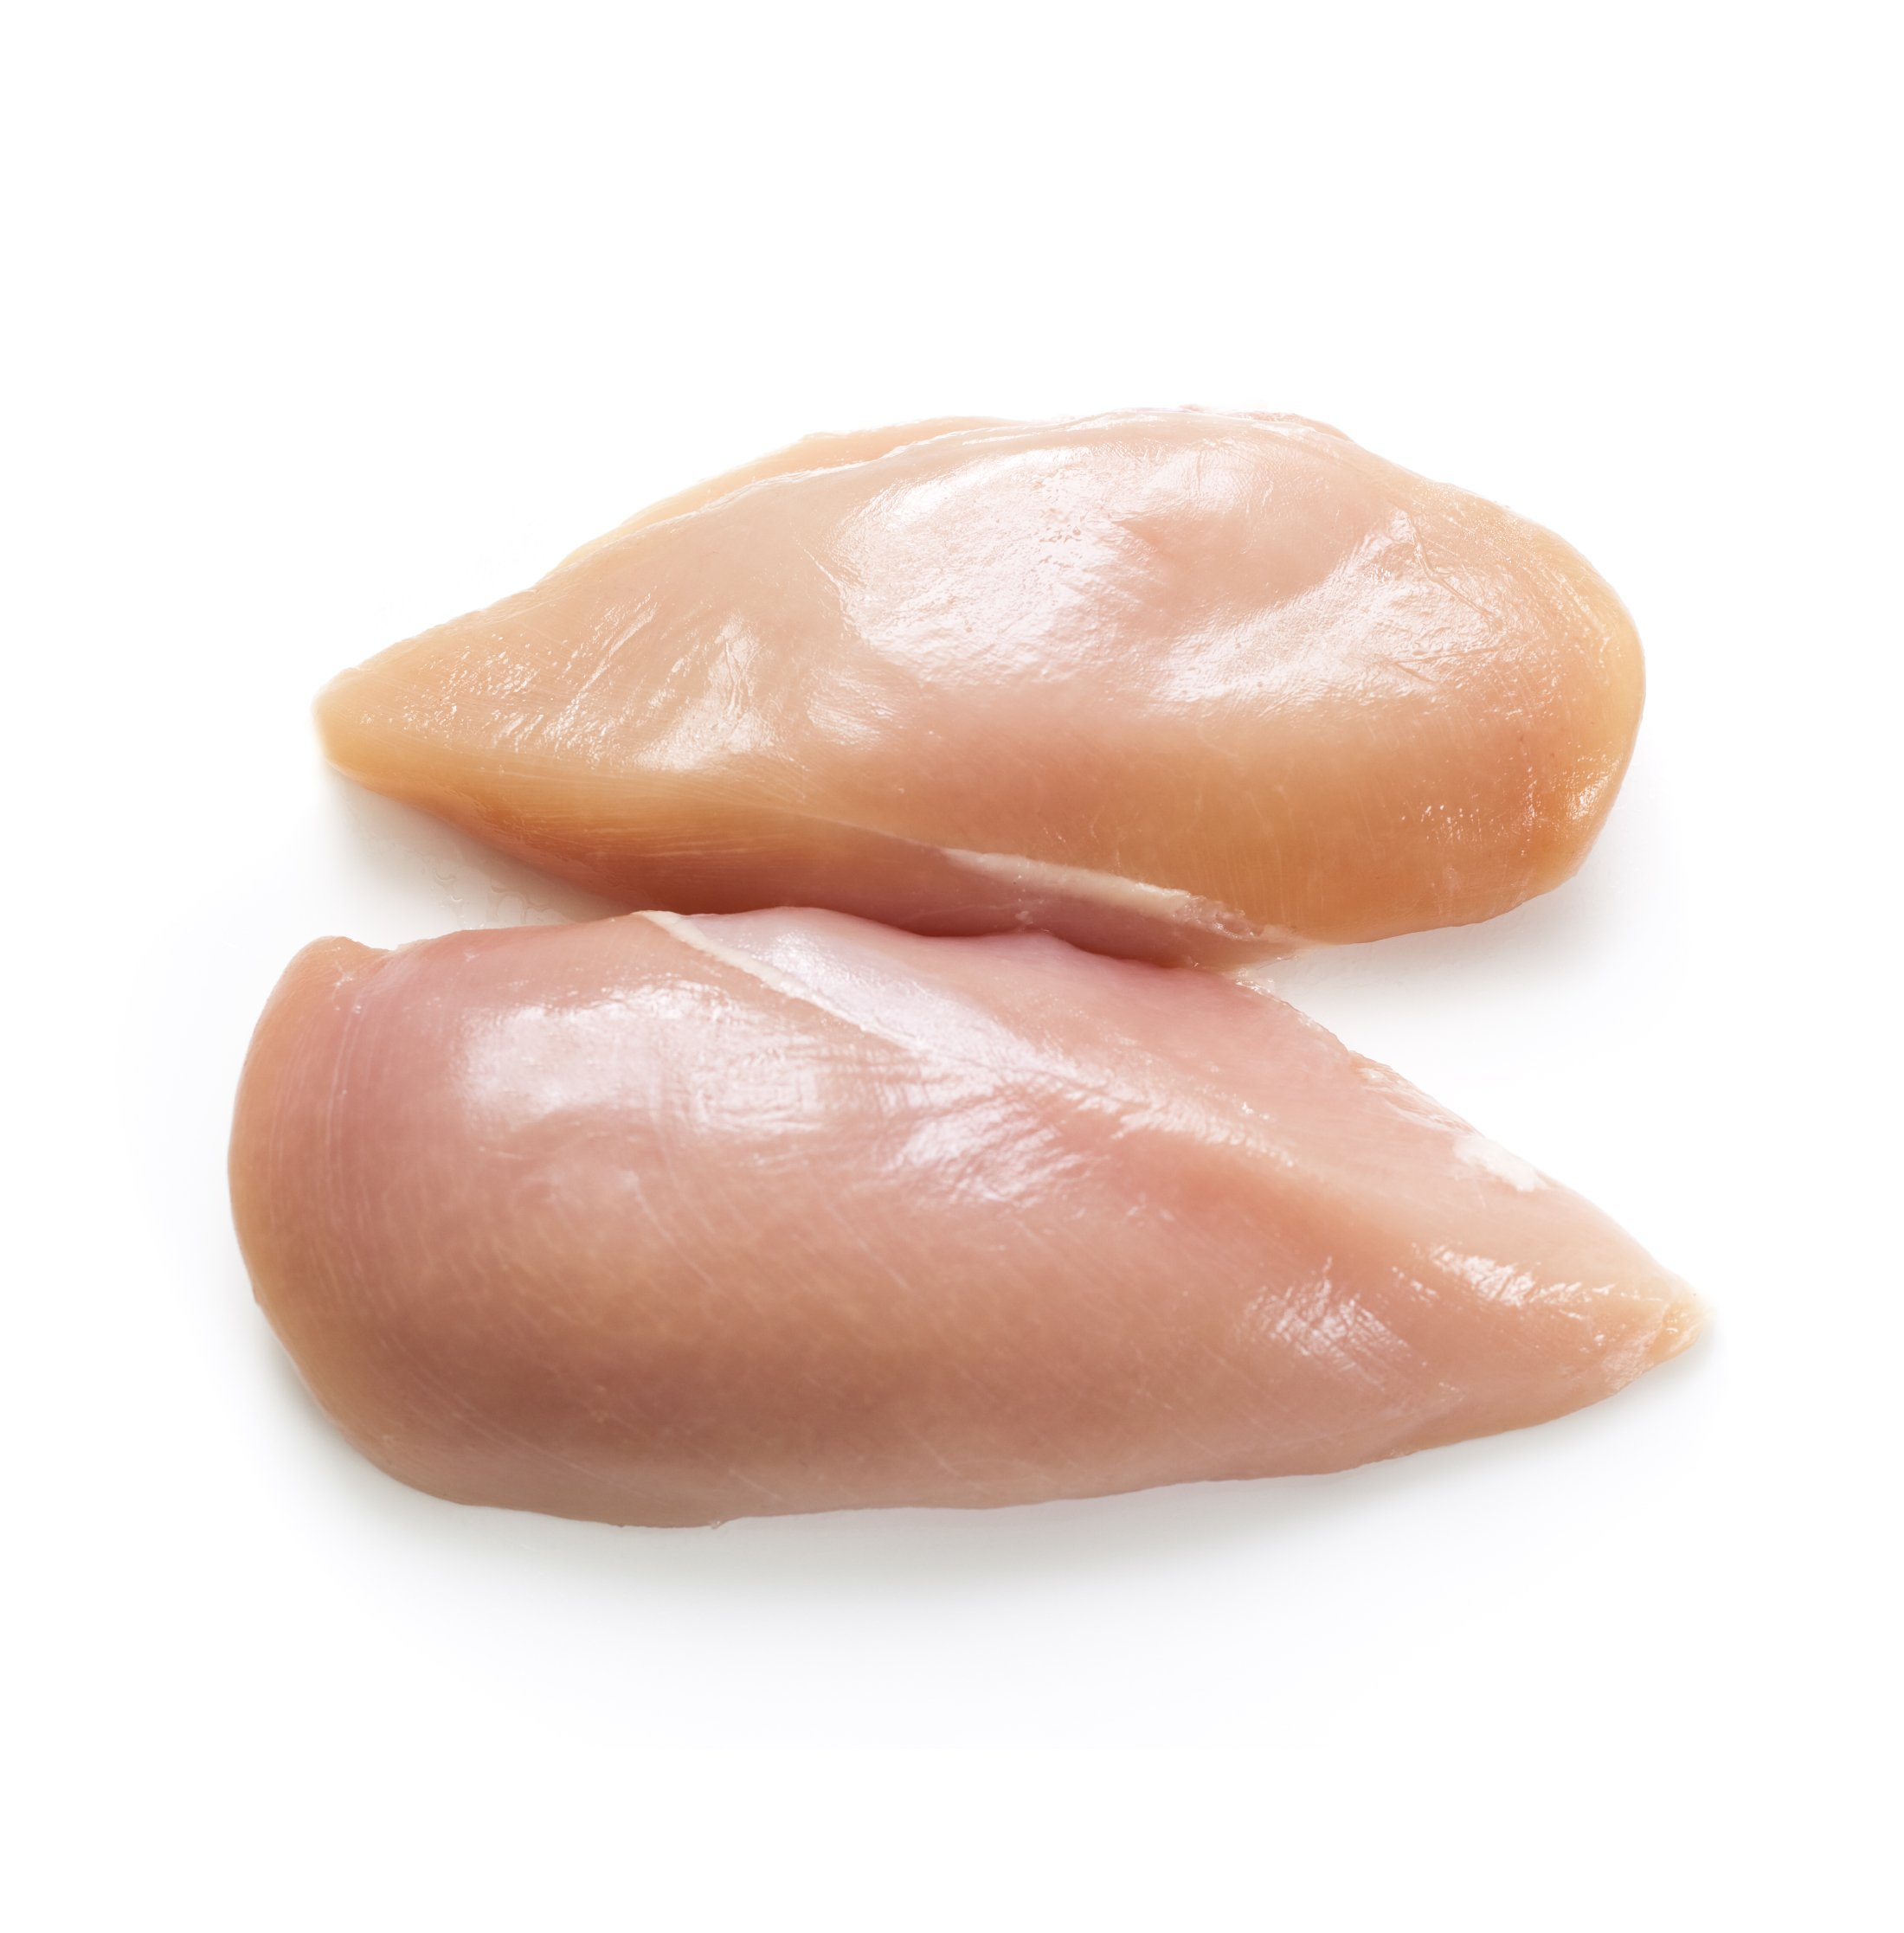 Double Certified Organic Chicken Breast Boneless/skinless (4.50-5 Lbs) - Glatt Kosher